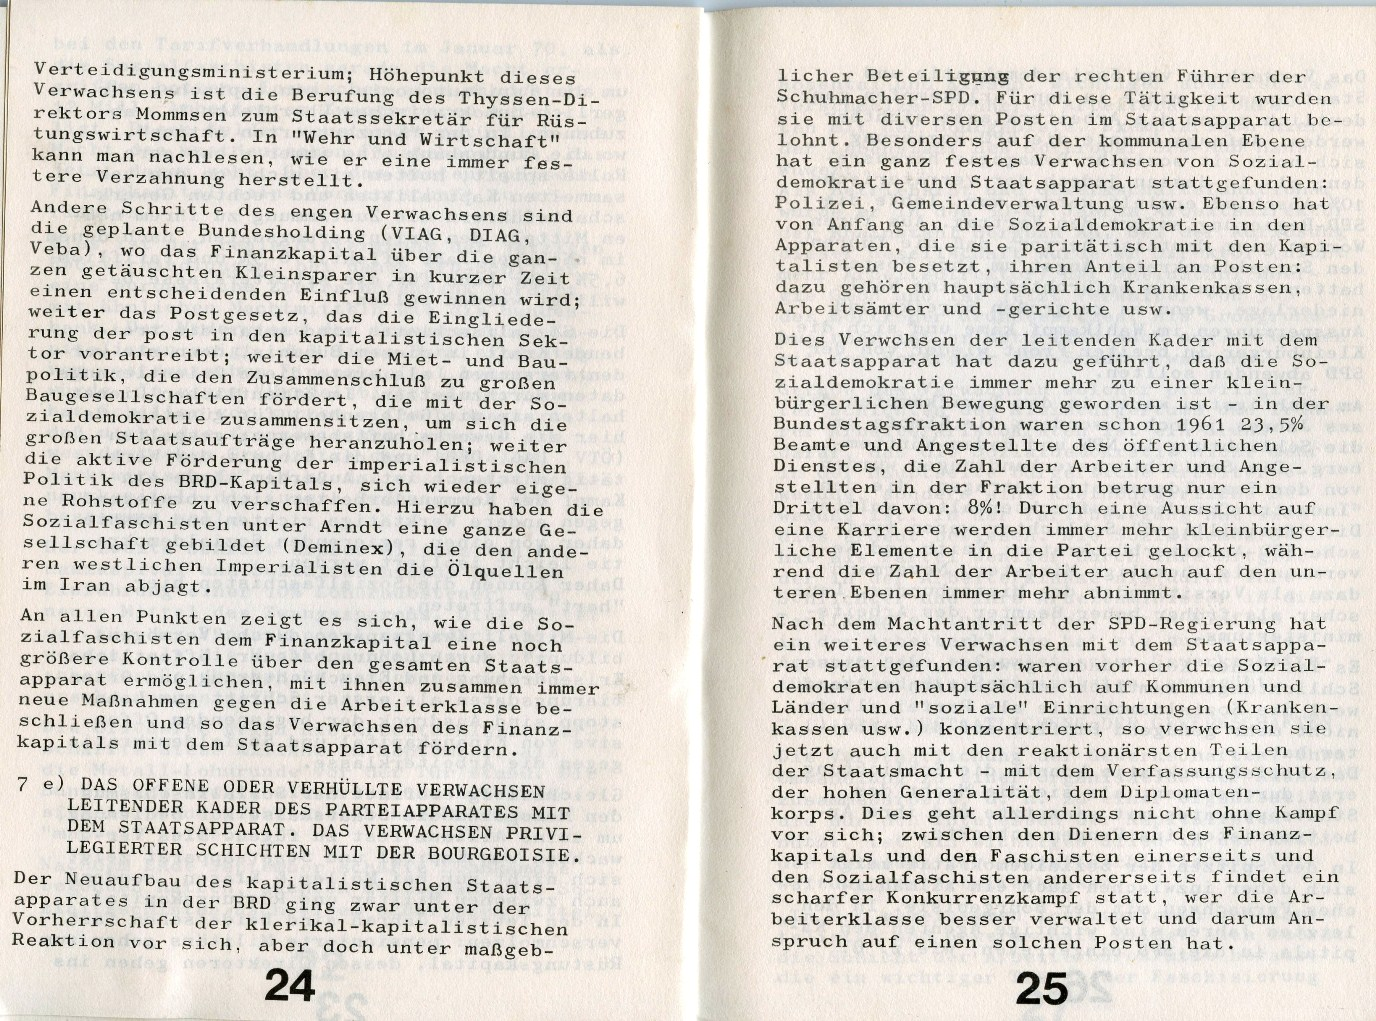 KJVD_Sozialdemokratie_Sozialfaschismus_1971_14